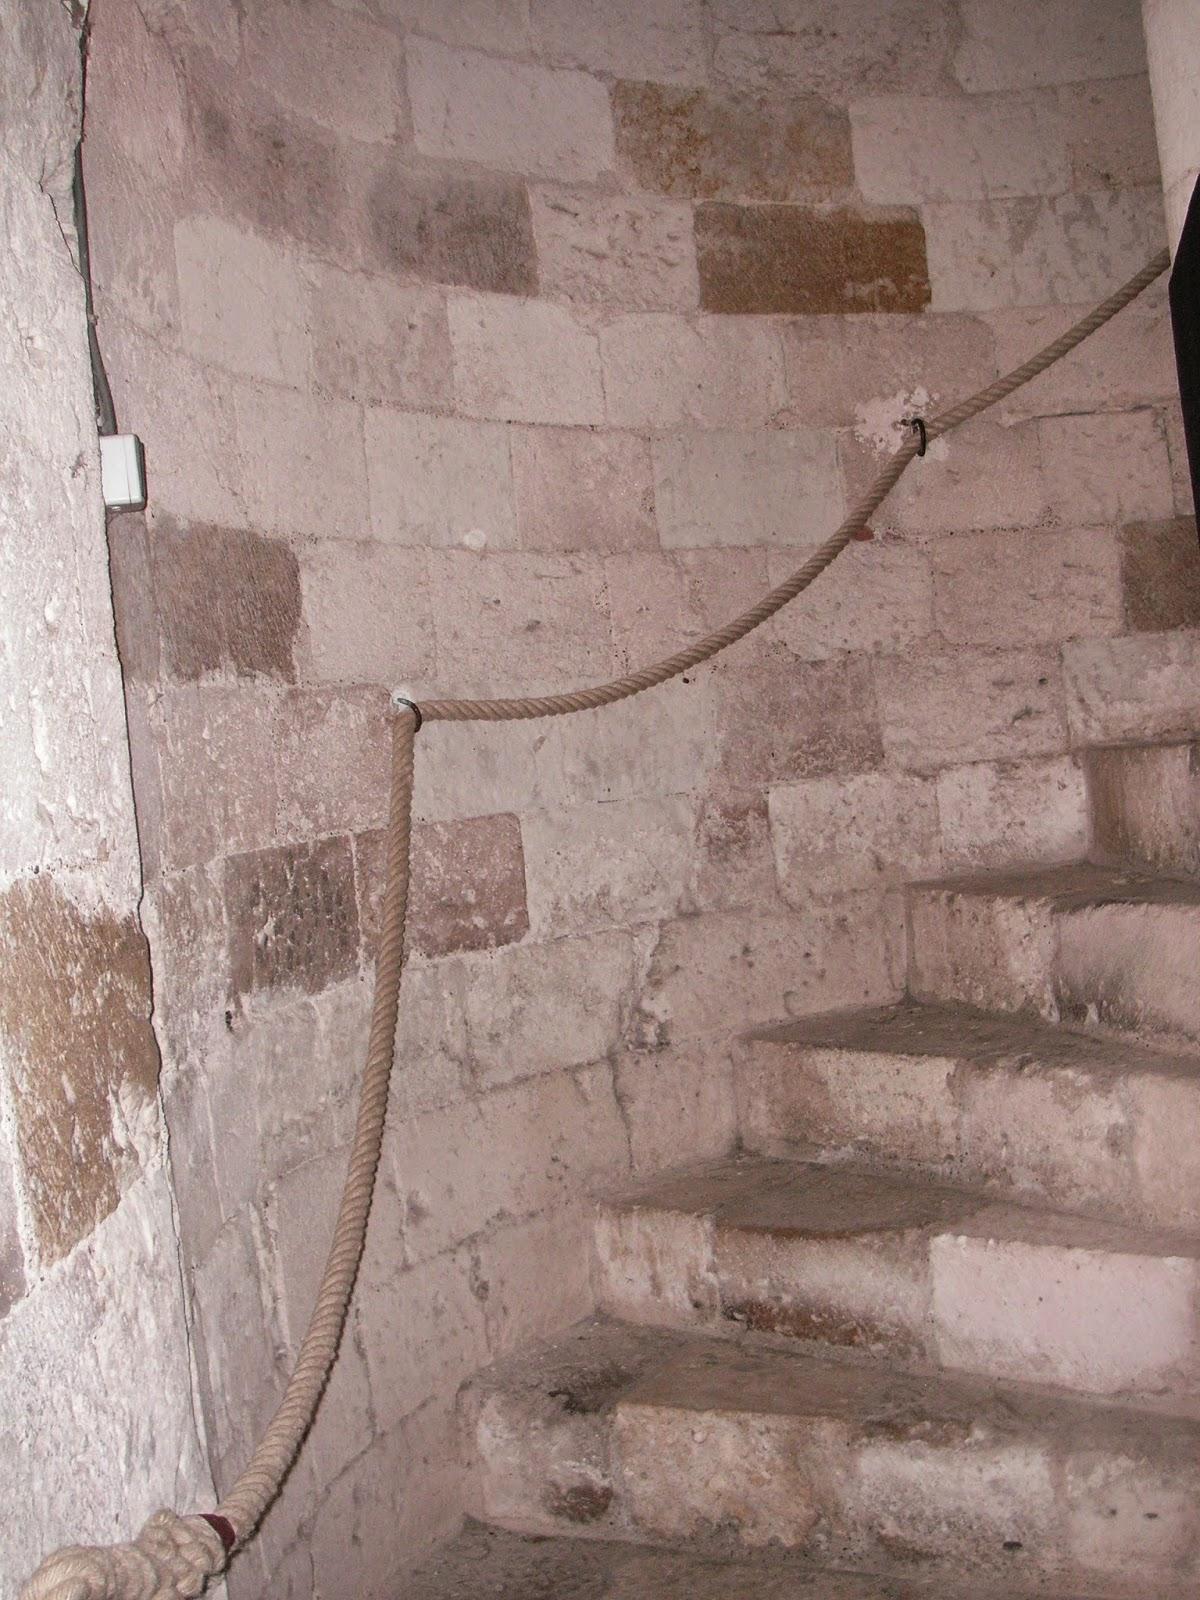 Main Courante Escalier Corde photos cordages : main courante cloître en corde chanvre 30mm